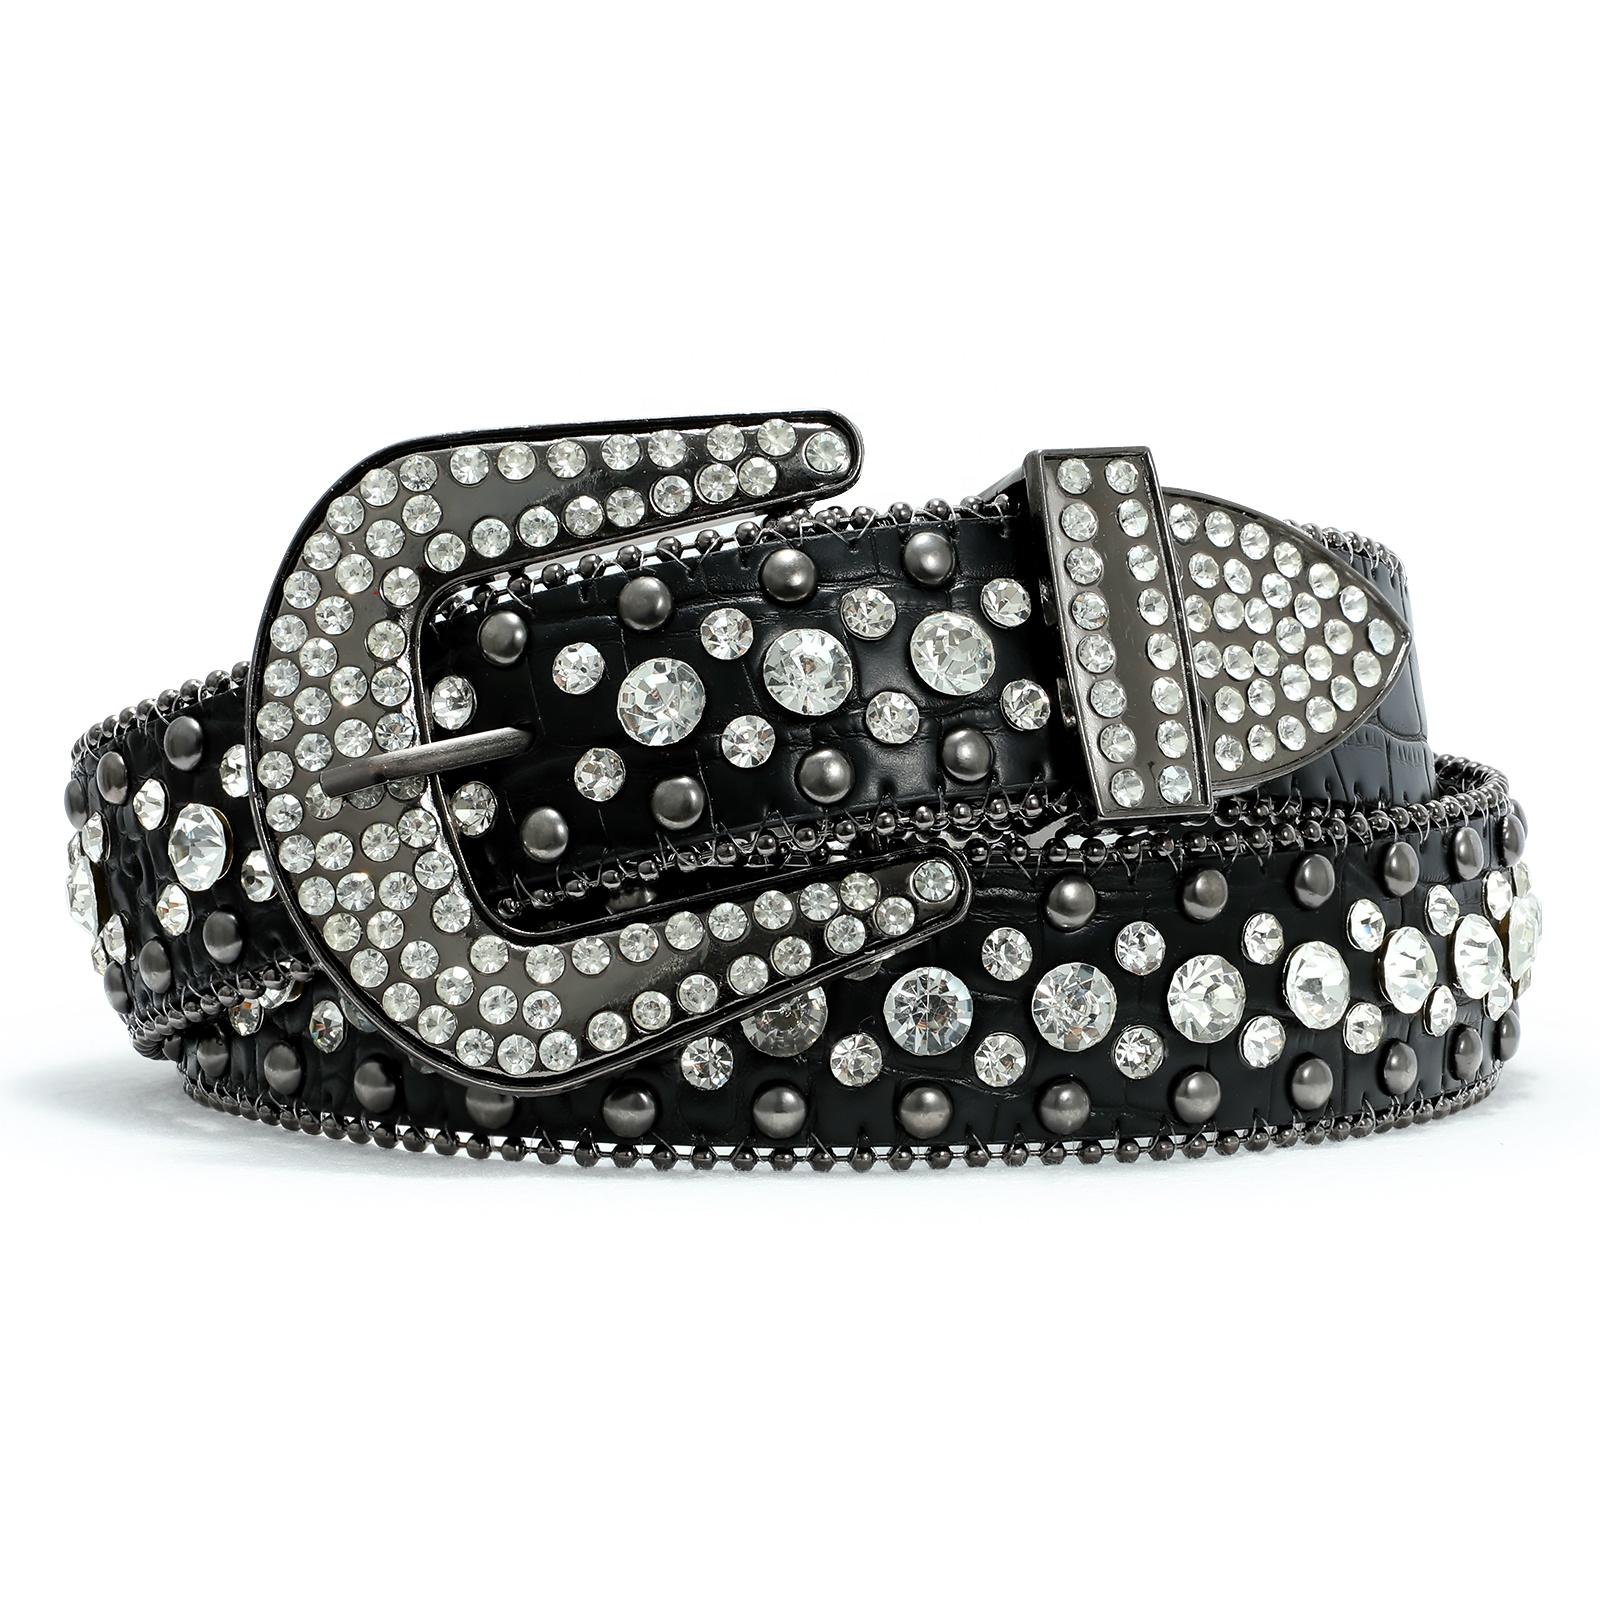 Luxury Crystal Belt Women Leather Men Unisex Diamond Studded Rhinestone Western Belt Stylish Designer Fancy Belt